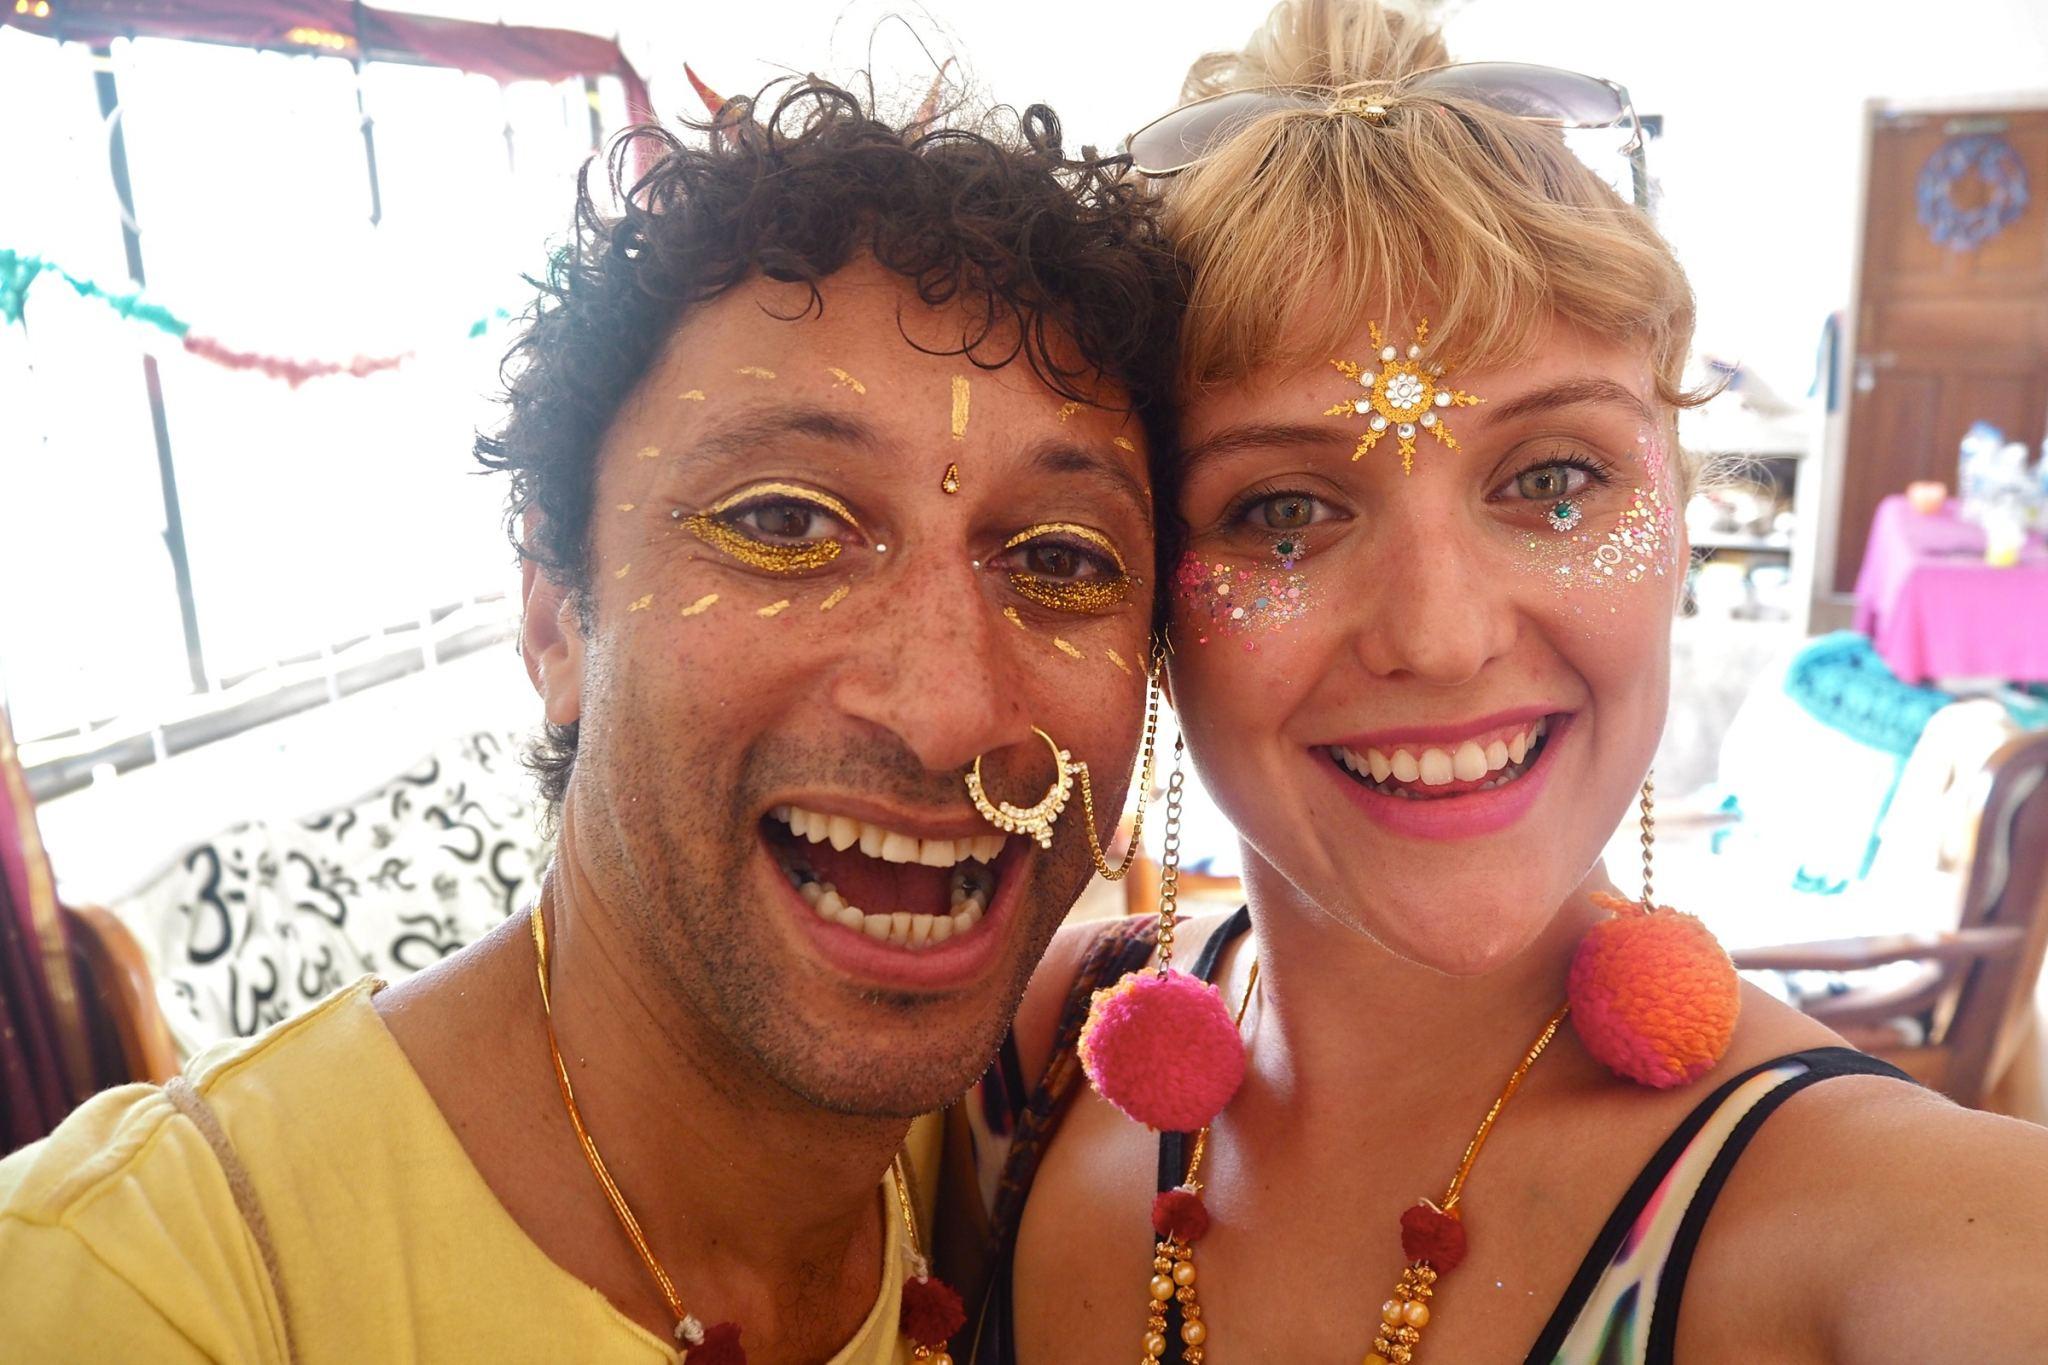 Festival glitter ideas at christmas in Arambol Goa Inida   That